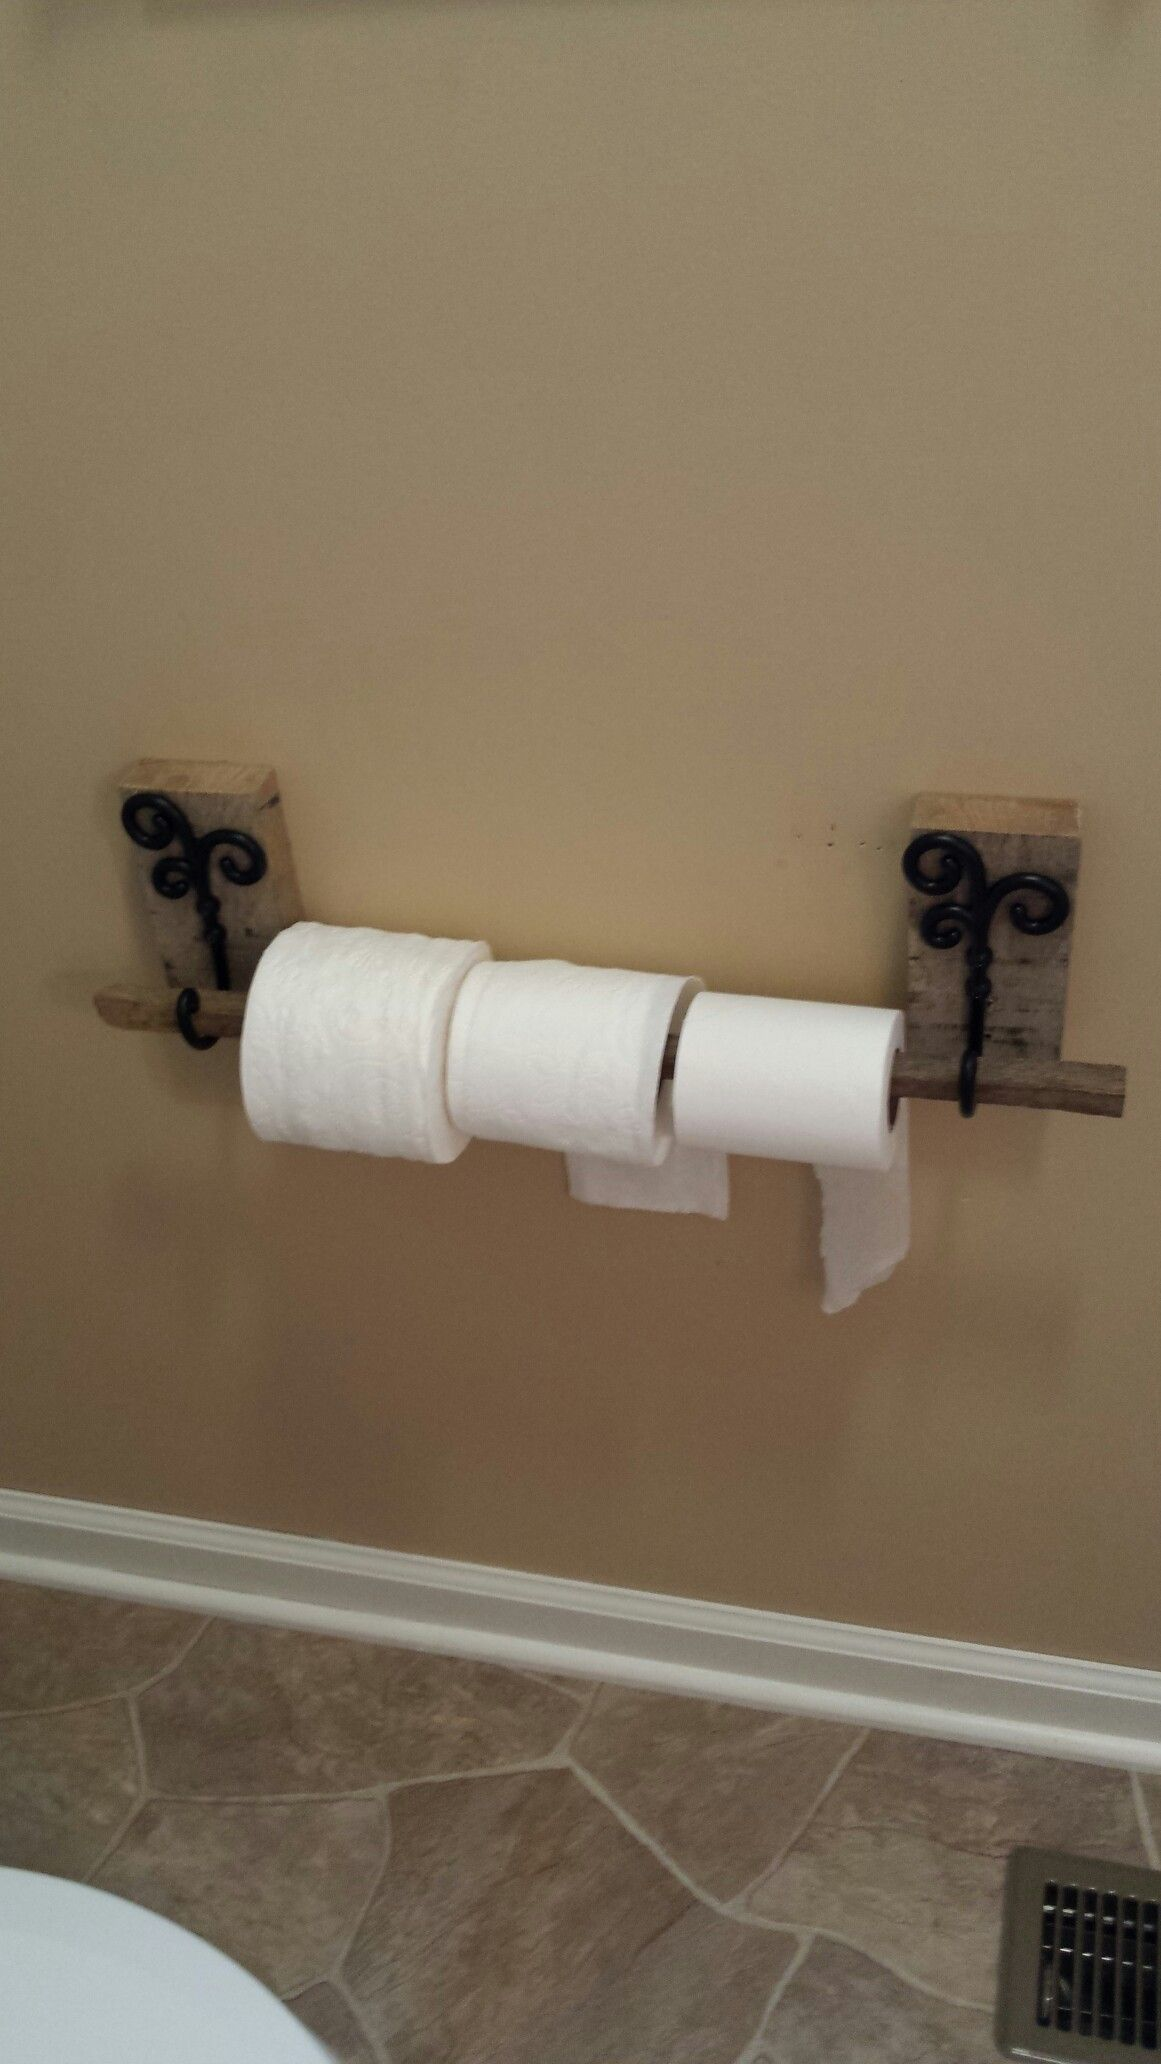 Tobacco Stick Toilet Paper Holder Toilet Paper Holder Toilet Paper Paper Holder